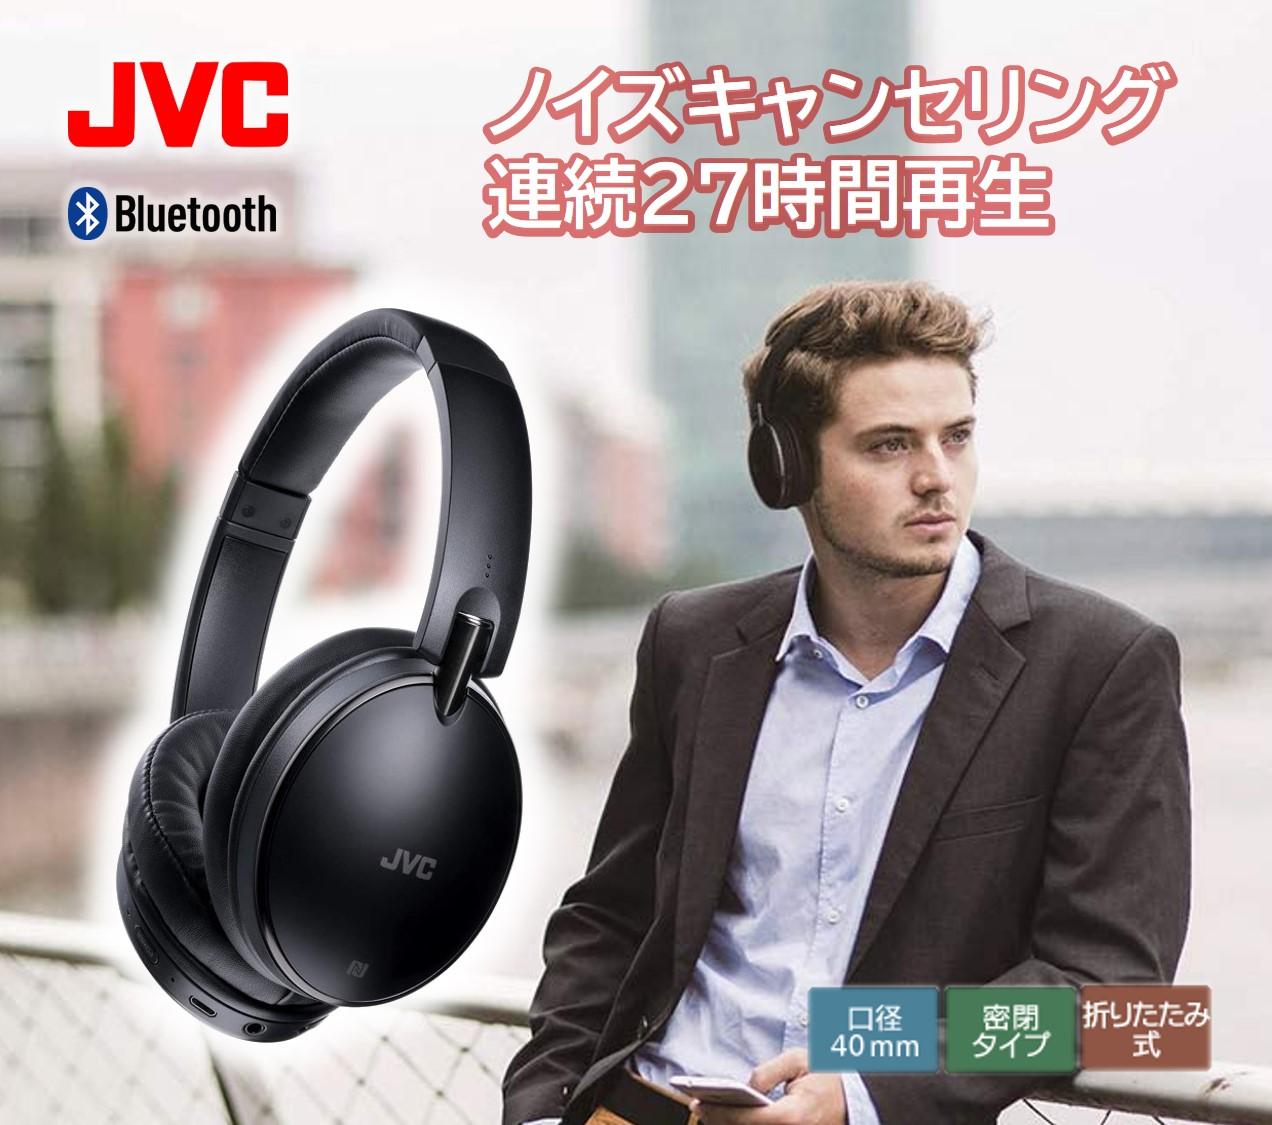 JVC ワイヤレスステレオヘッドセット